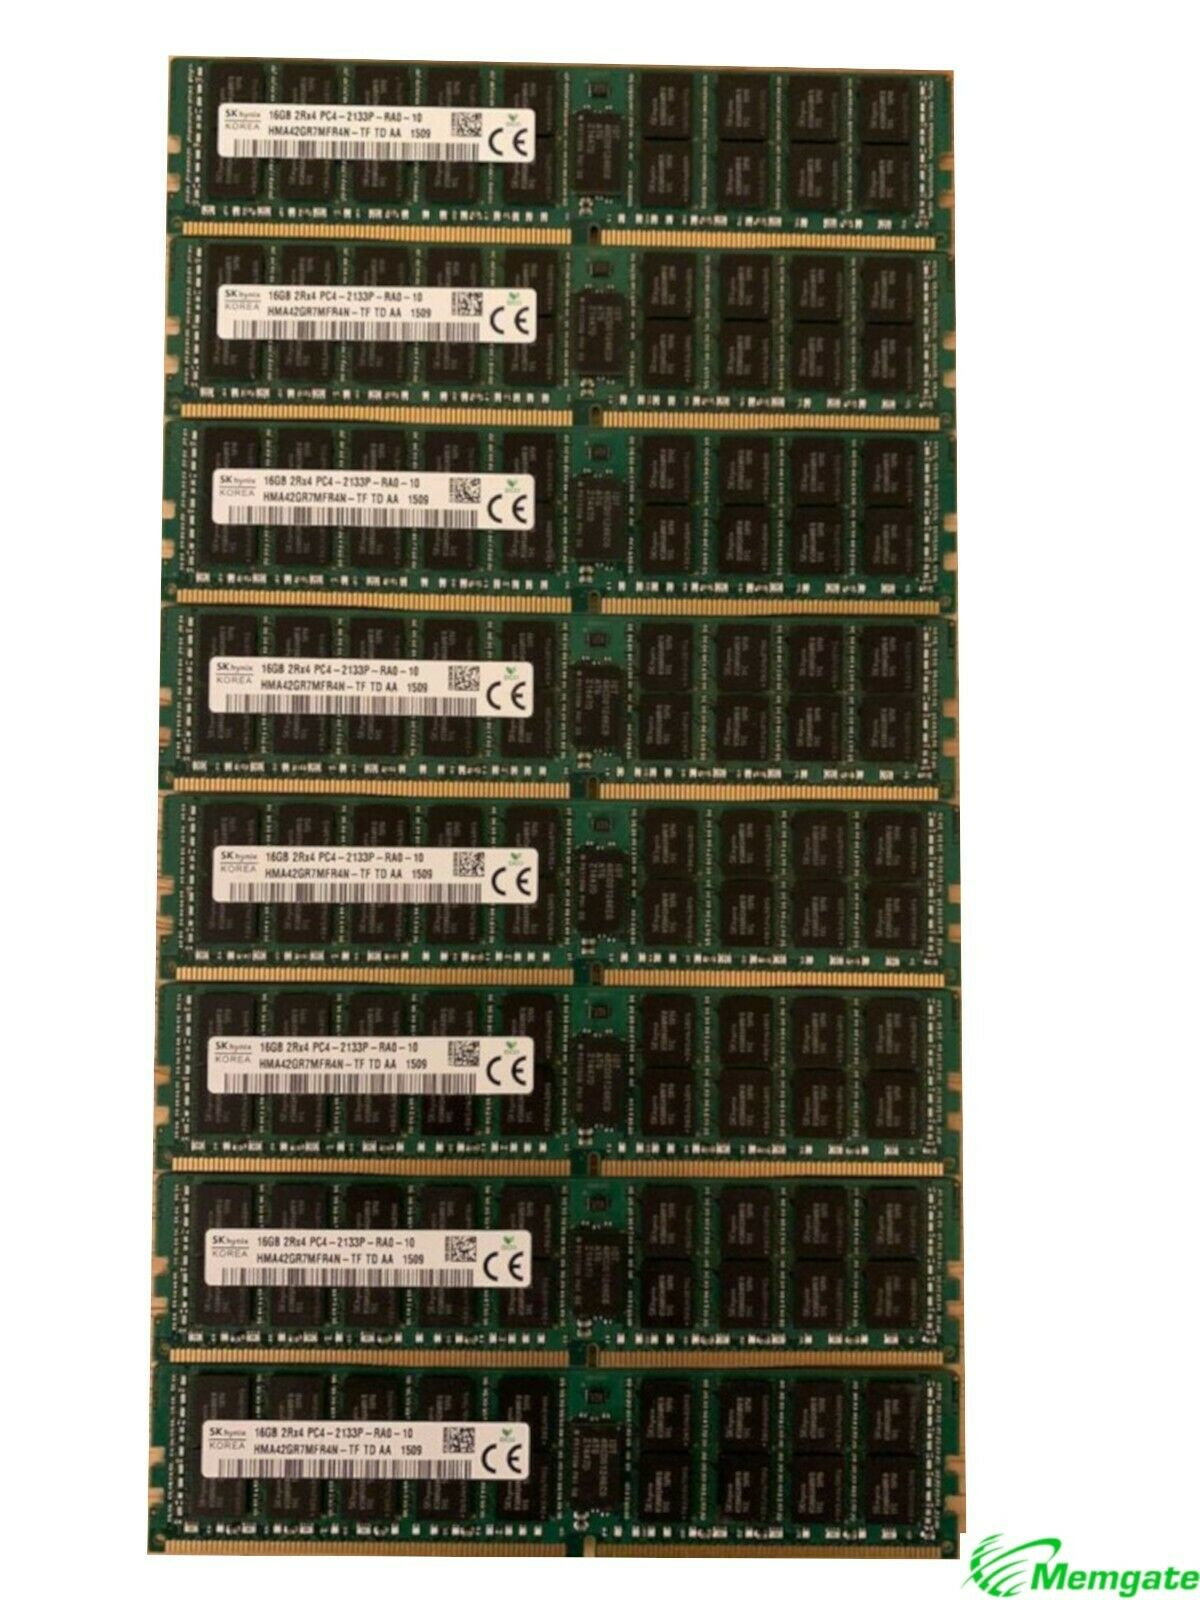 64GB (4x16GB) DDR4 2133P ECC RDIMM Memory for Dell PowerEdge R730 R730XD R630. Buy it now for 219.70